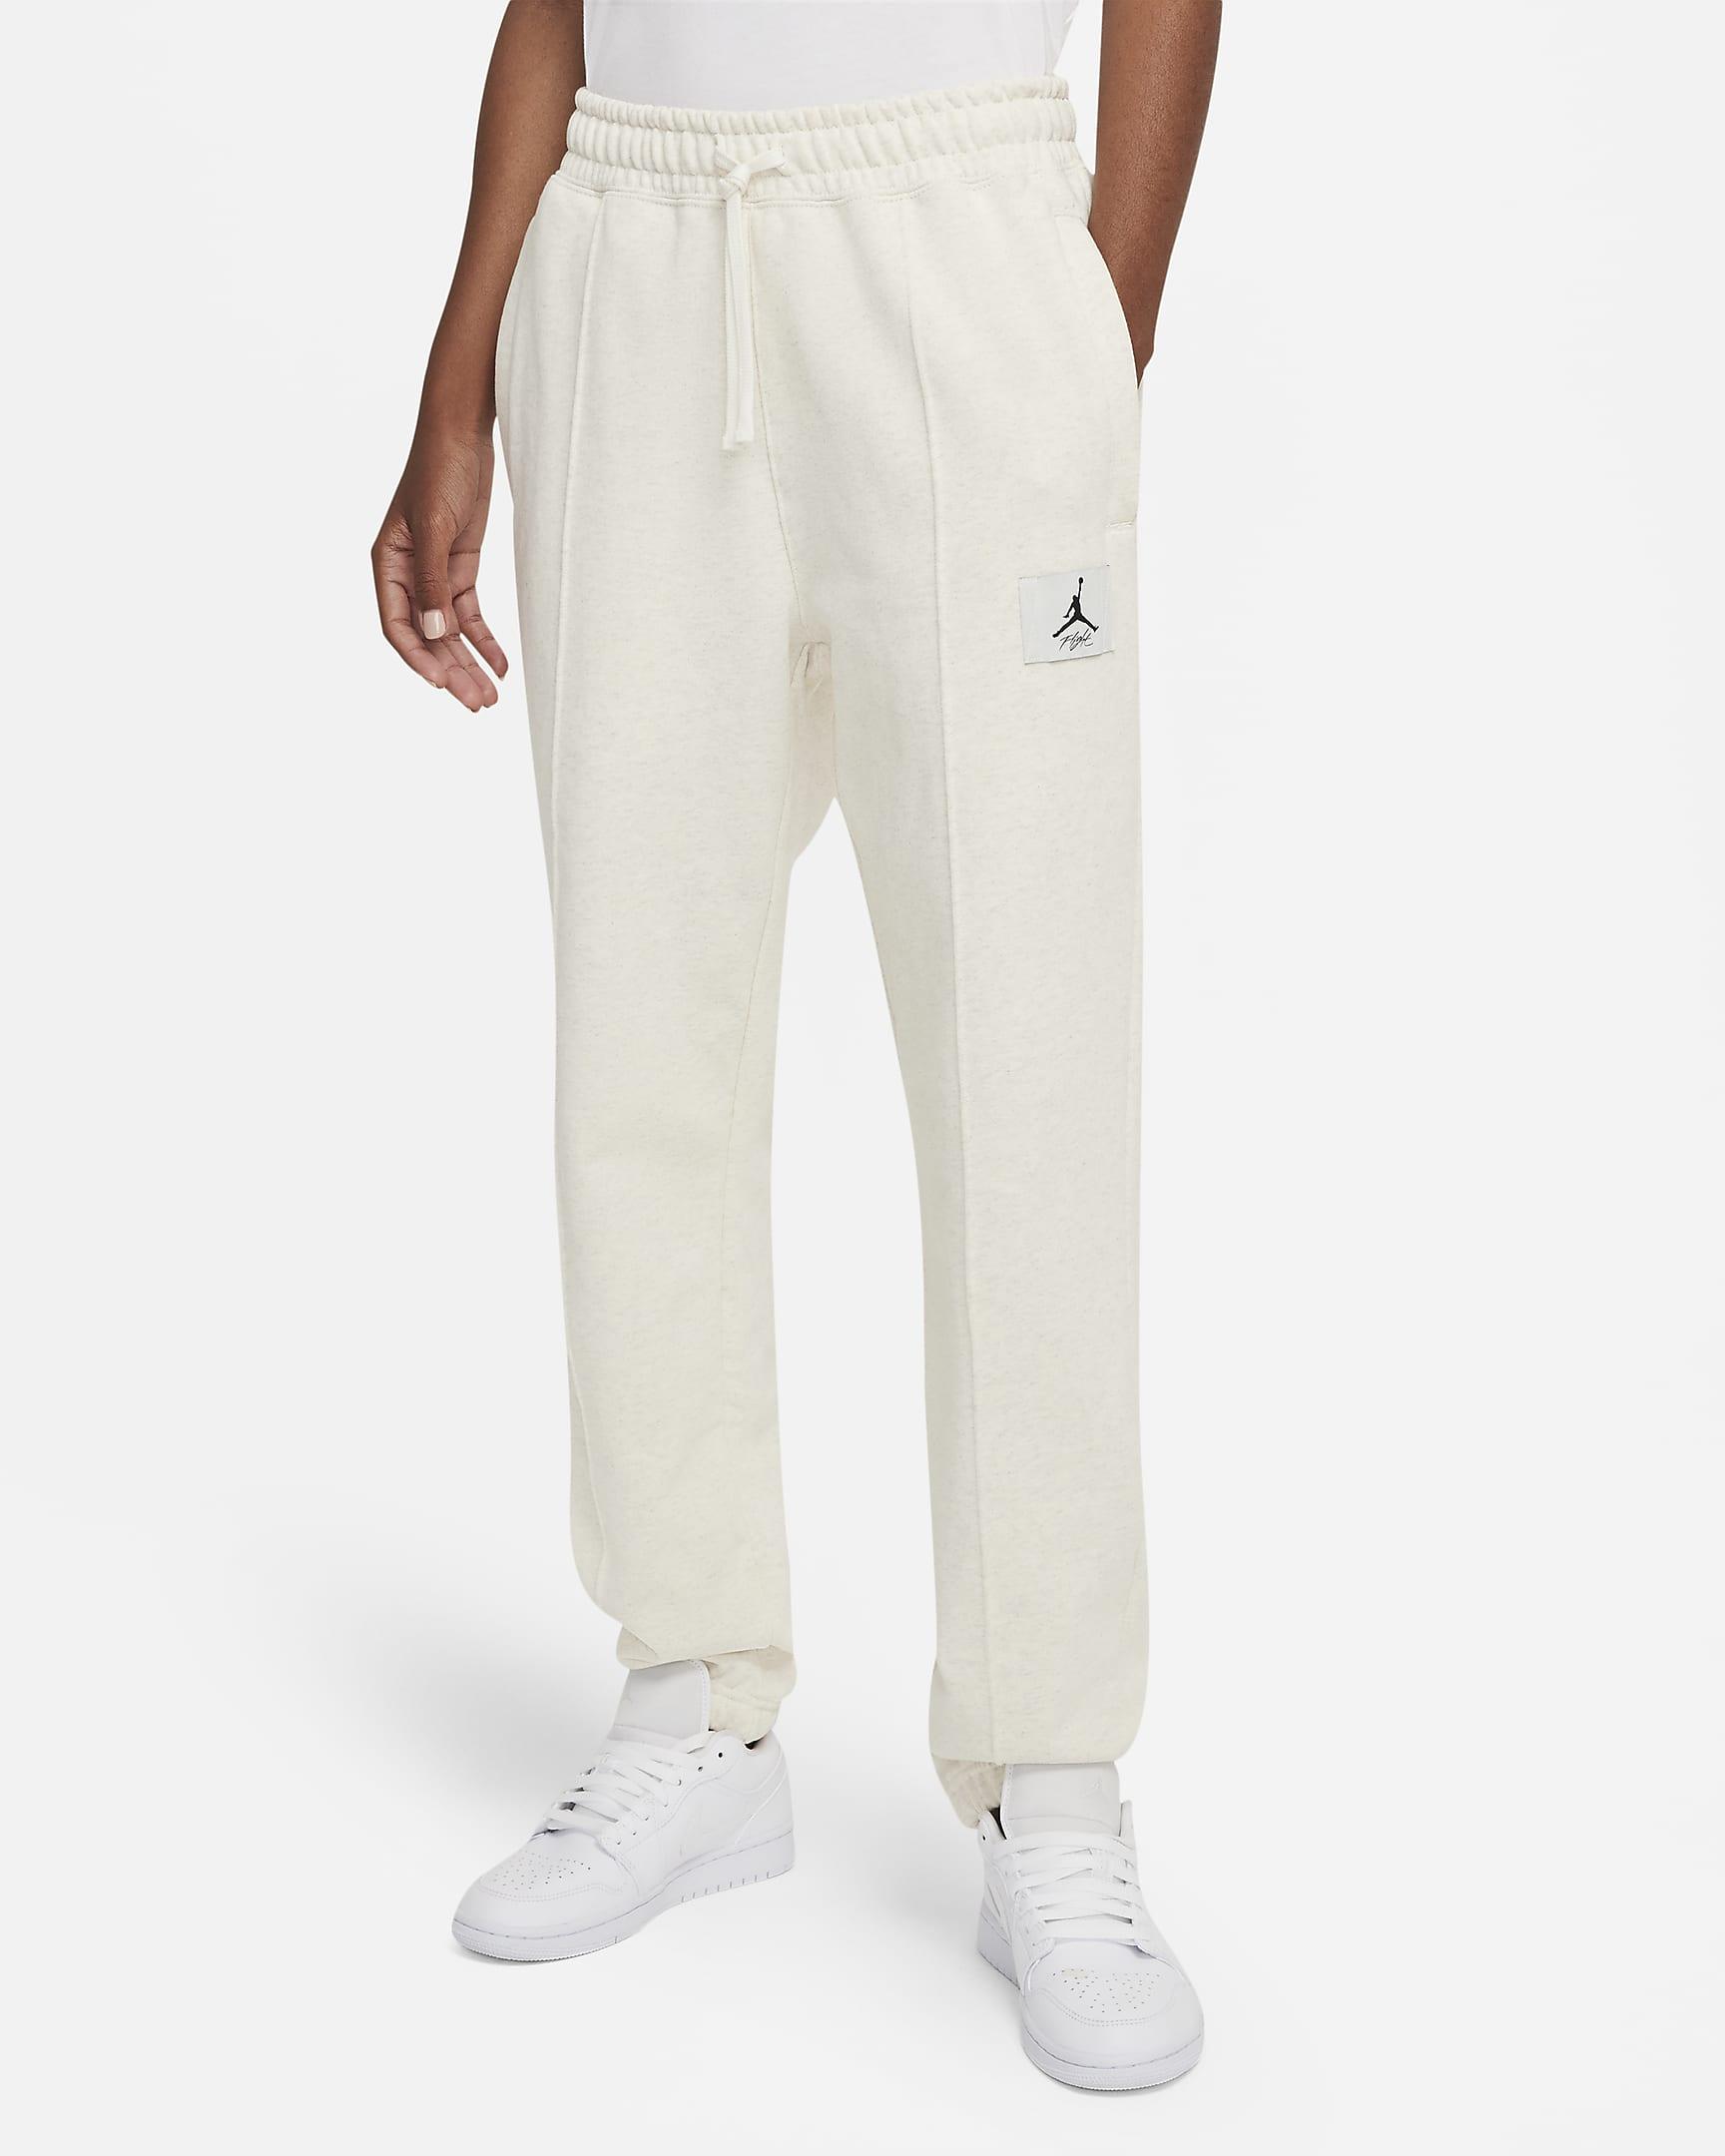 jordan-essentials-womens-fleece-pants-Hf4lN3.png